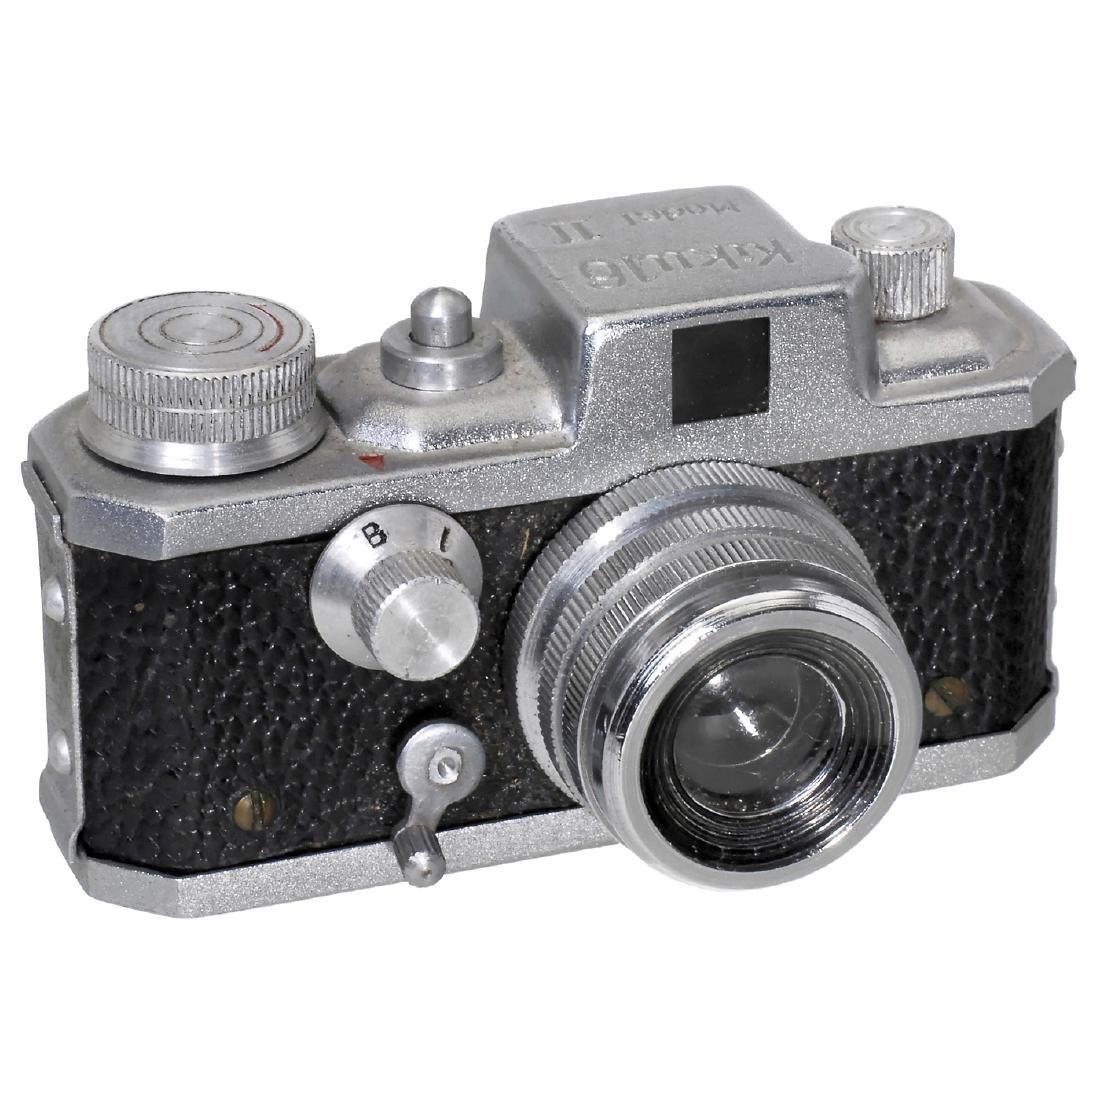 Kiku 16 Model II, c. 1956